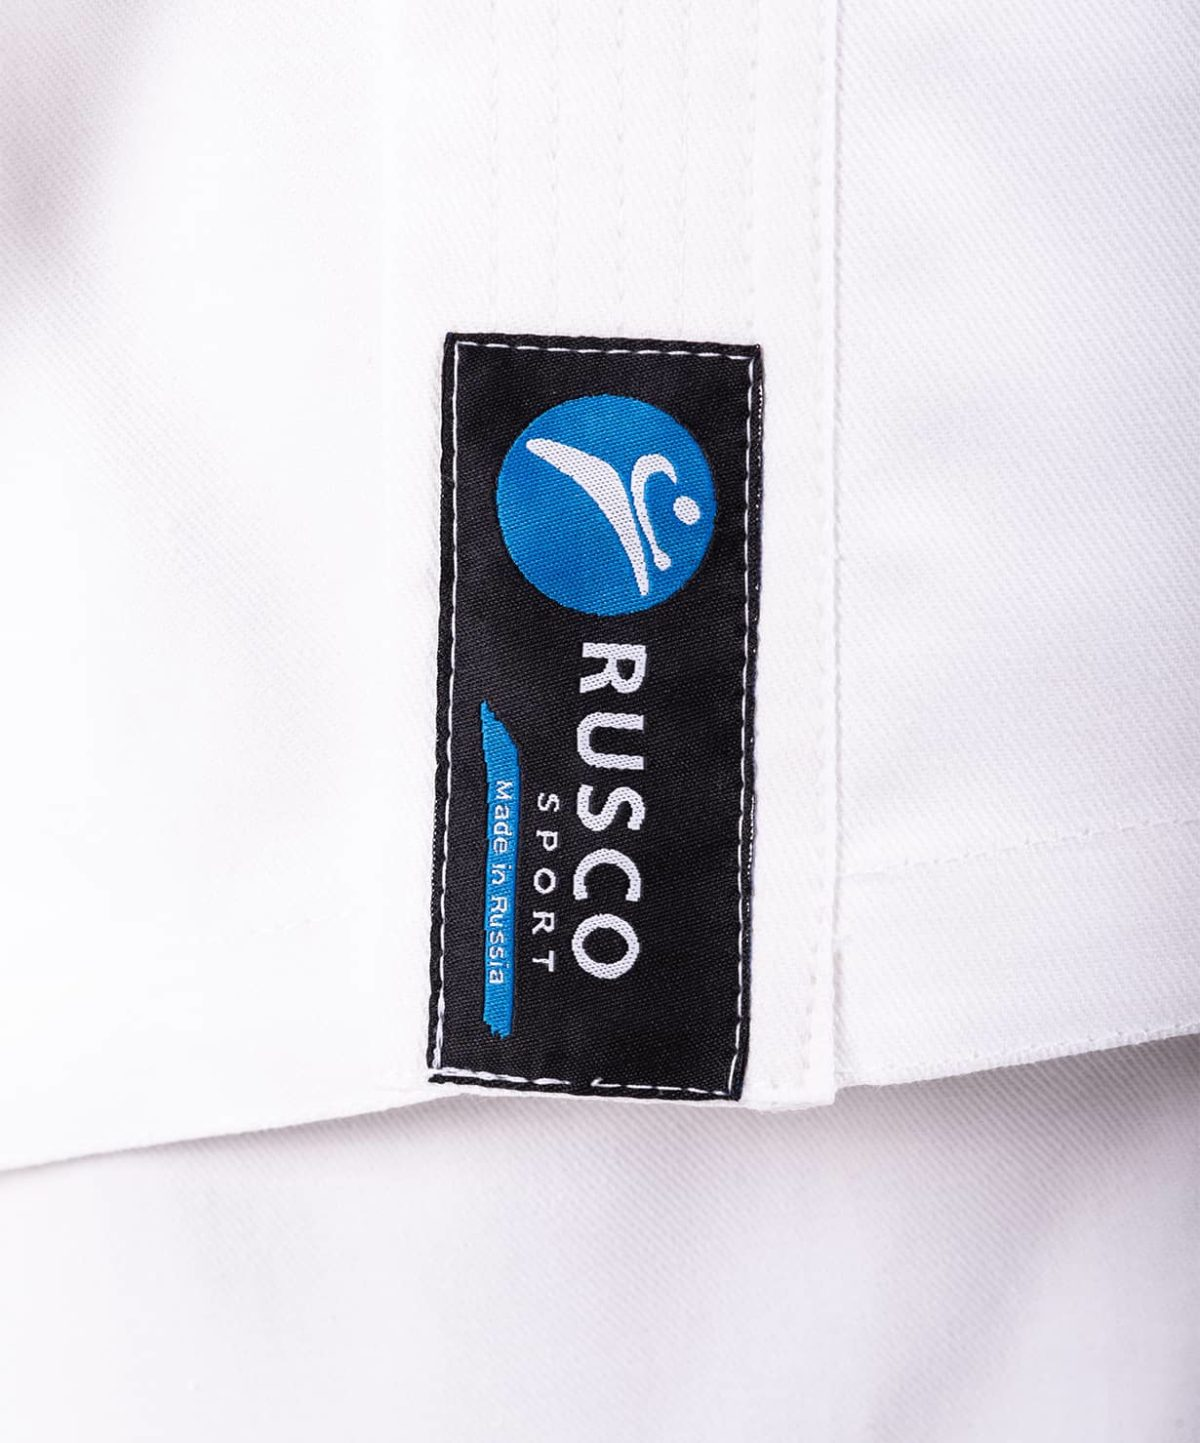 RUSCO Кимоно для рукопашного боя 6/190 Classic  17243 - 3